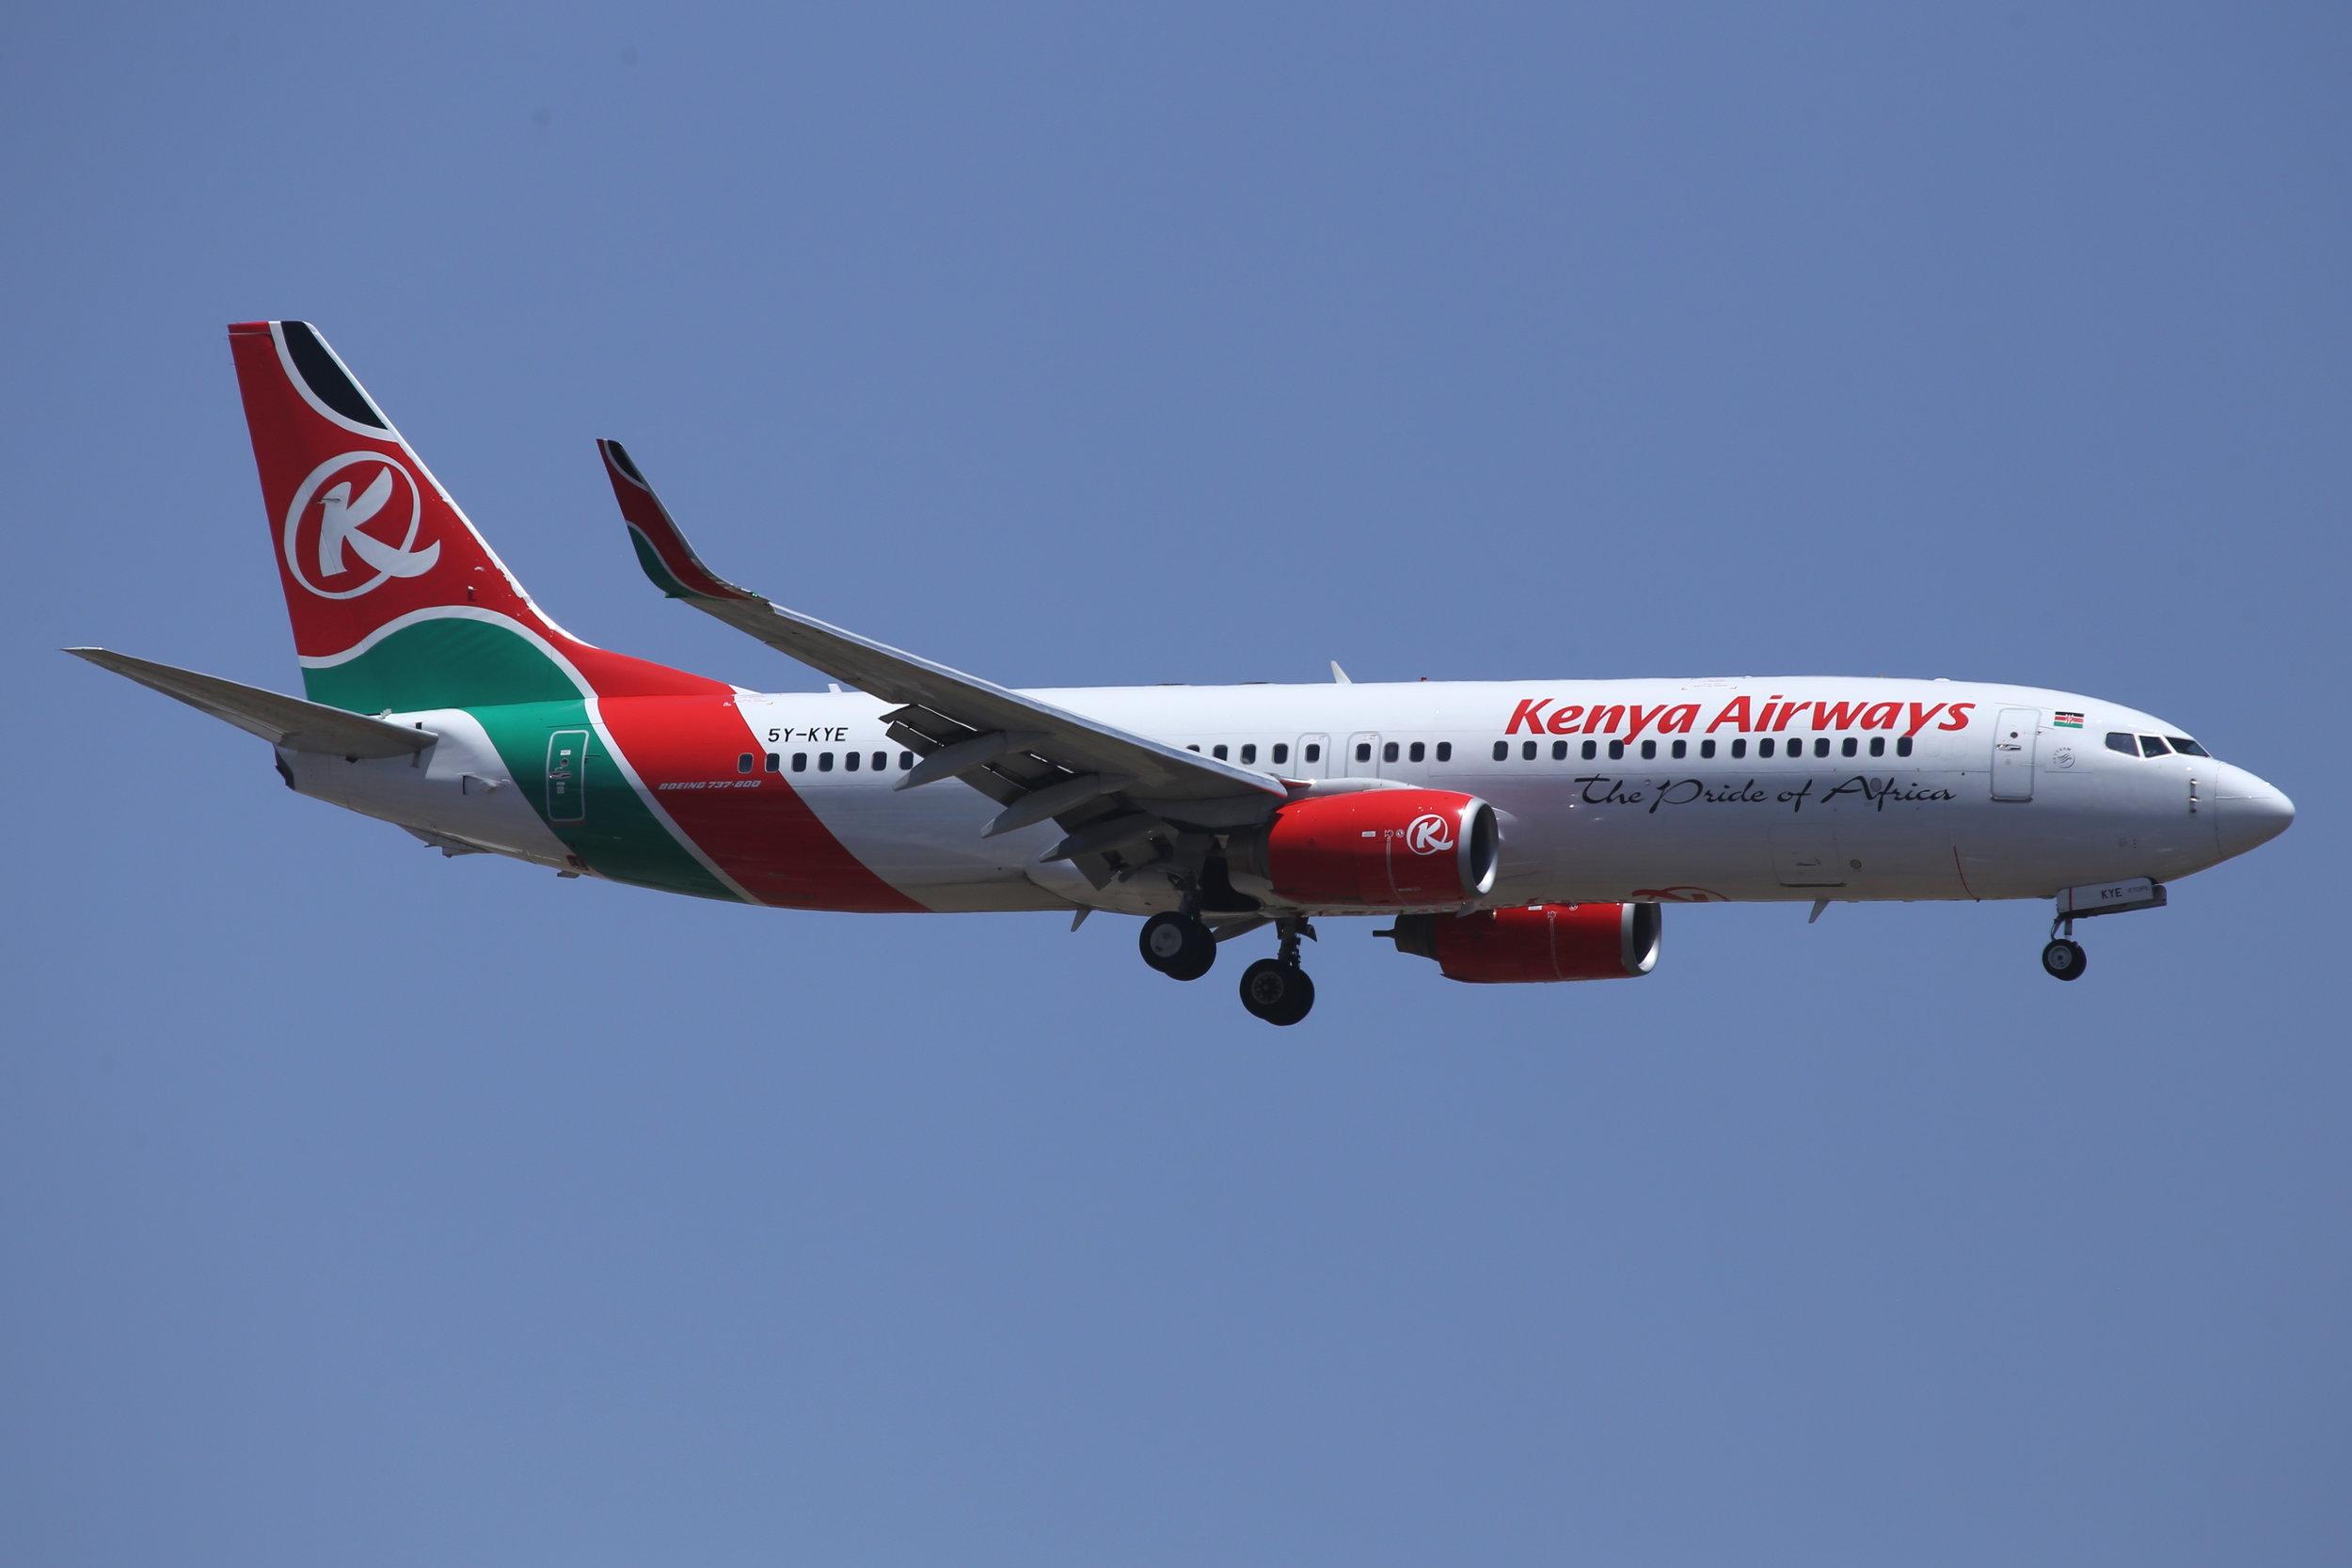 5Y-KYE Kenya Airways B737-8W taken at Johannesburg 11th November 2018 by John Wood